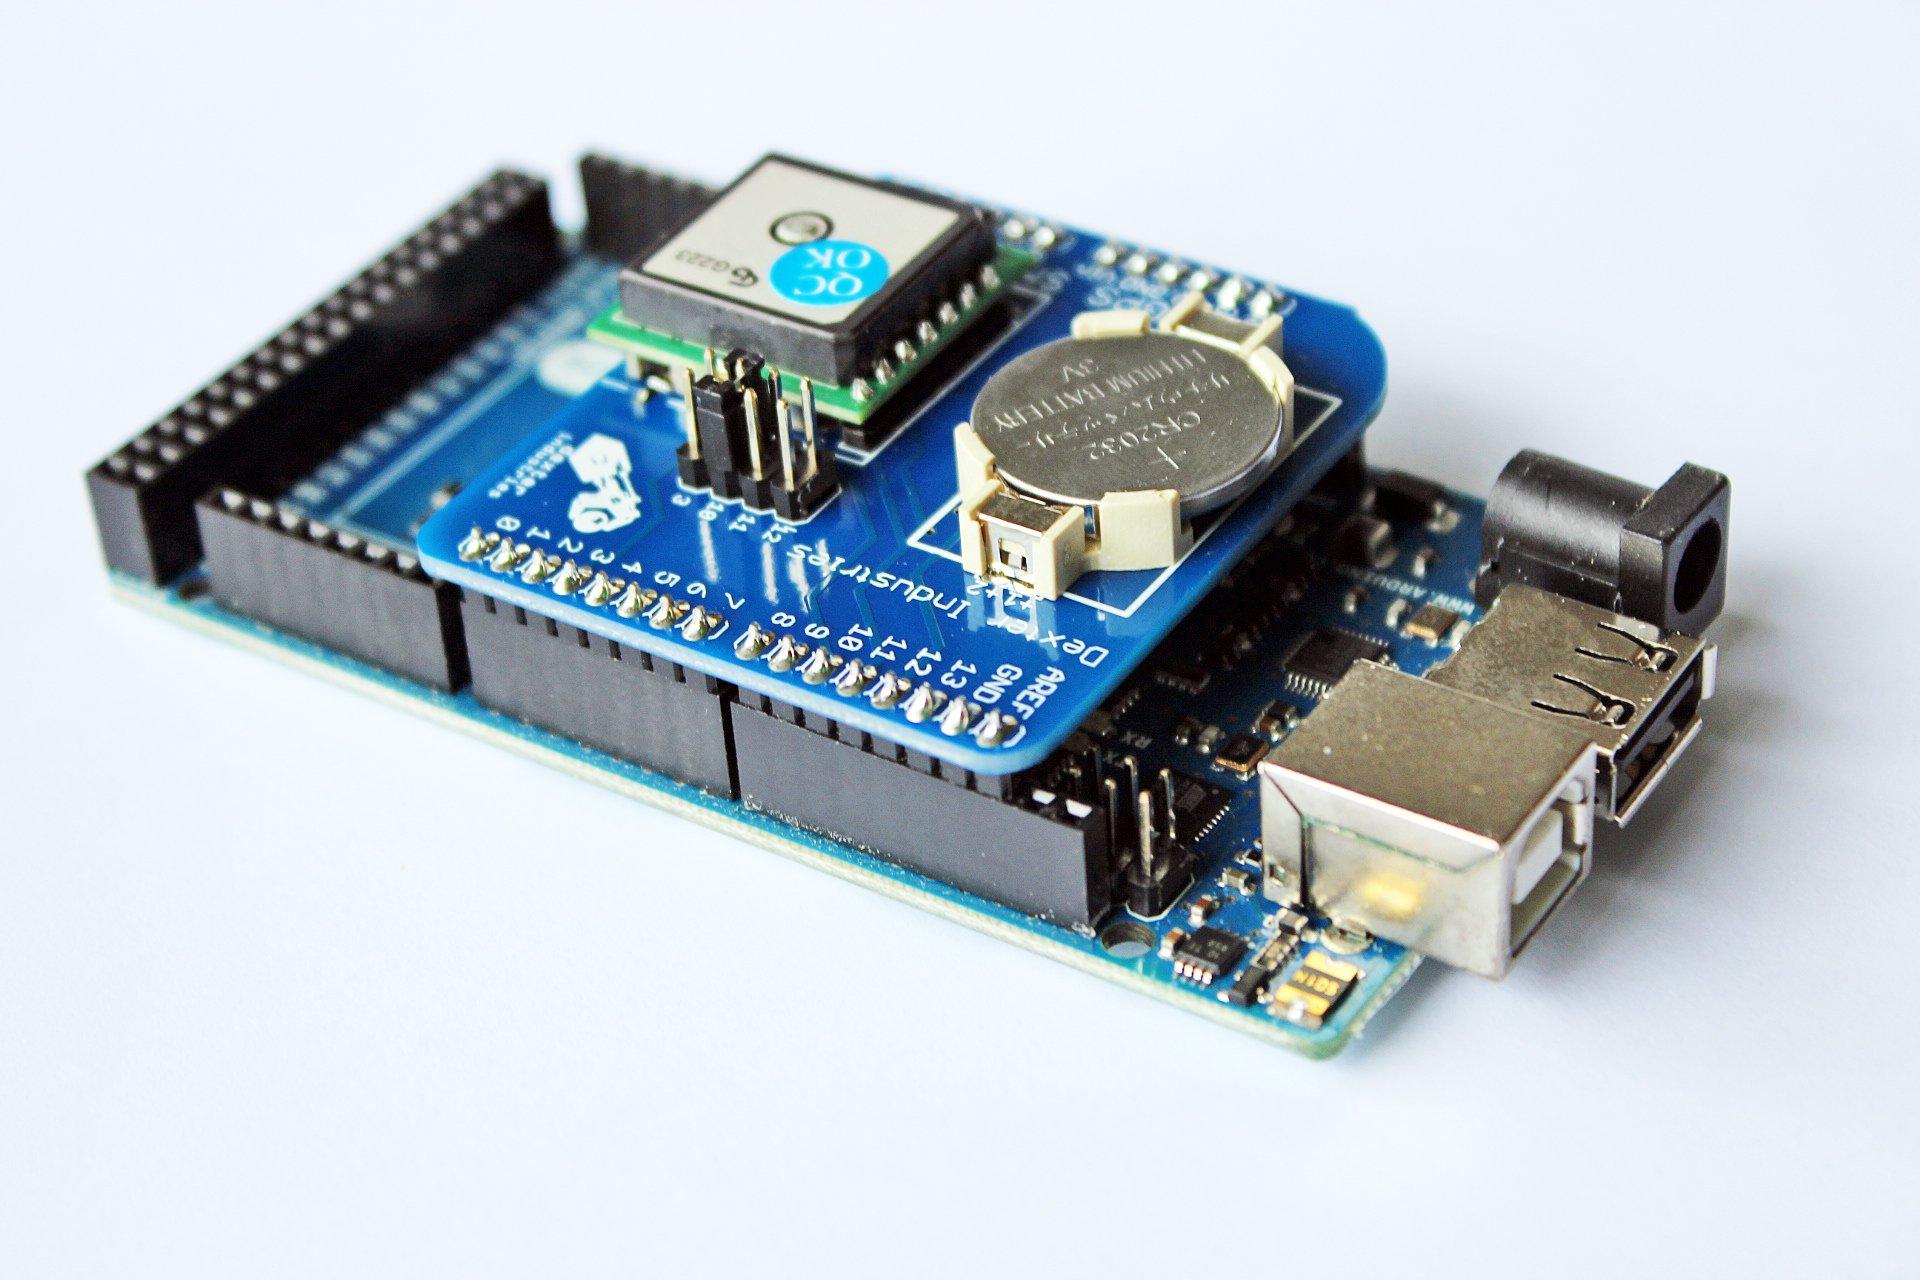 Arduino gps shield from dexterindustries on tindie